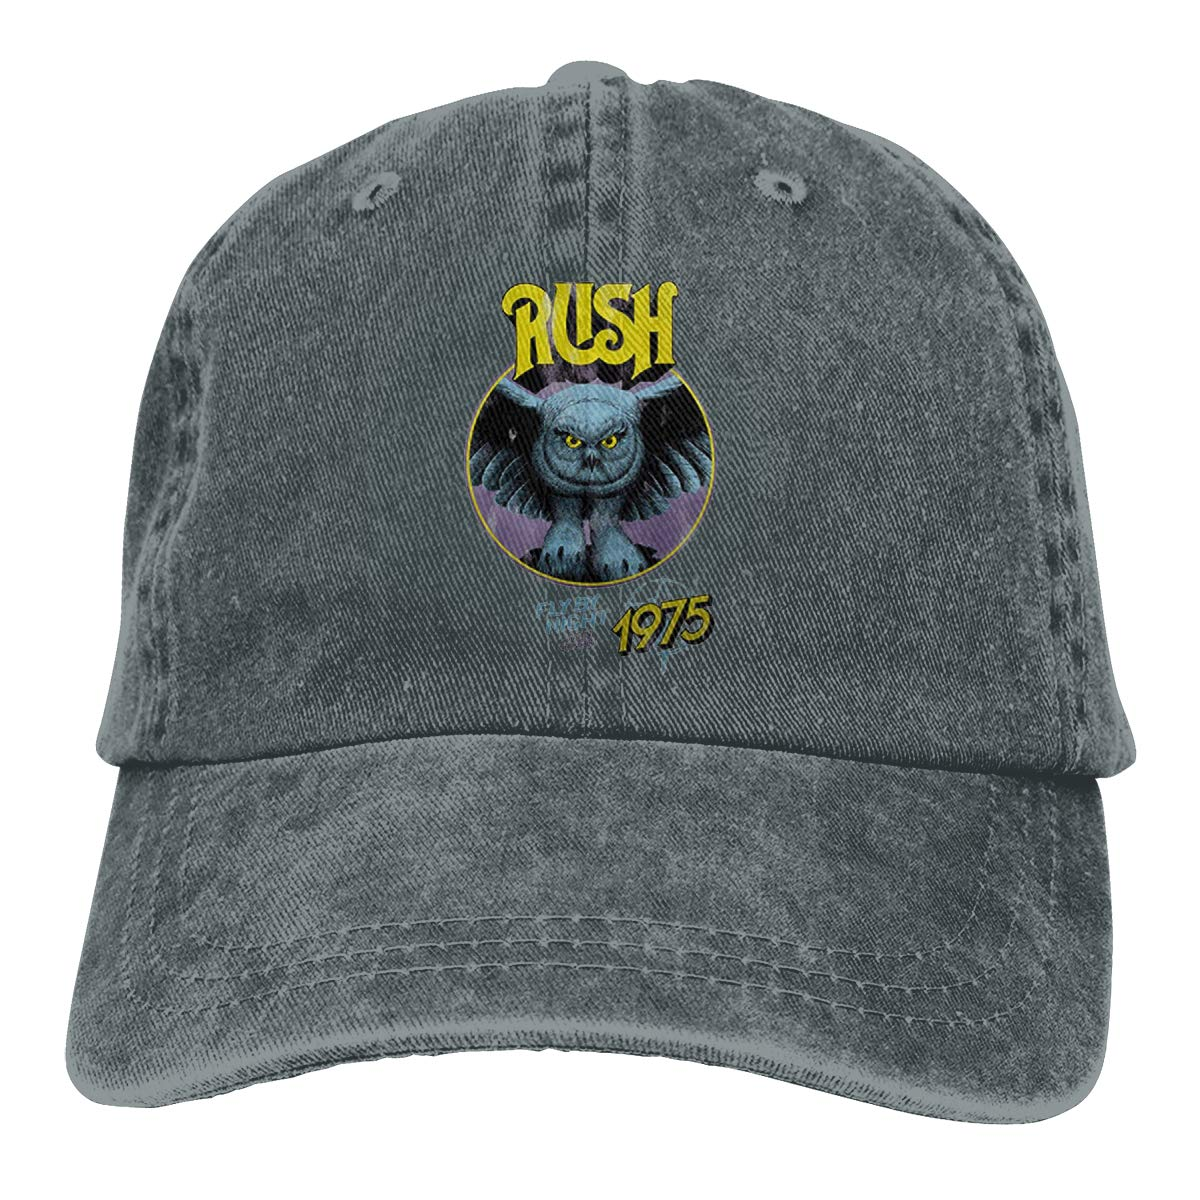 Zlizhi Rush Fly by Night Live 75 Men Women Plain Cotton Adjustable Washed Twill Low Profile Baseball Cap Hat